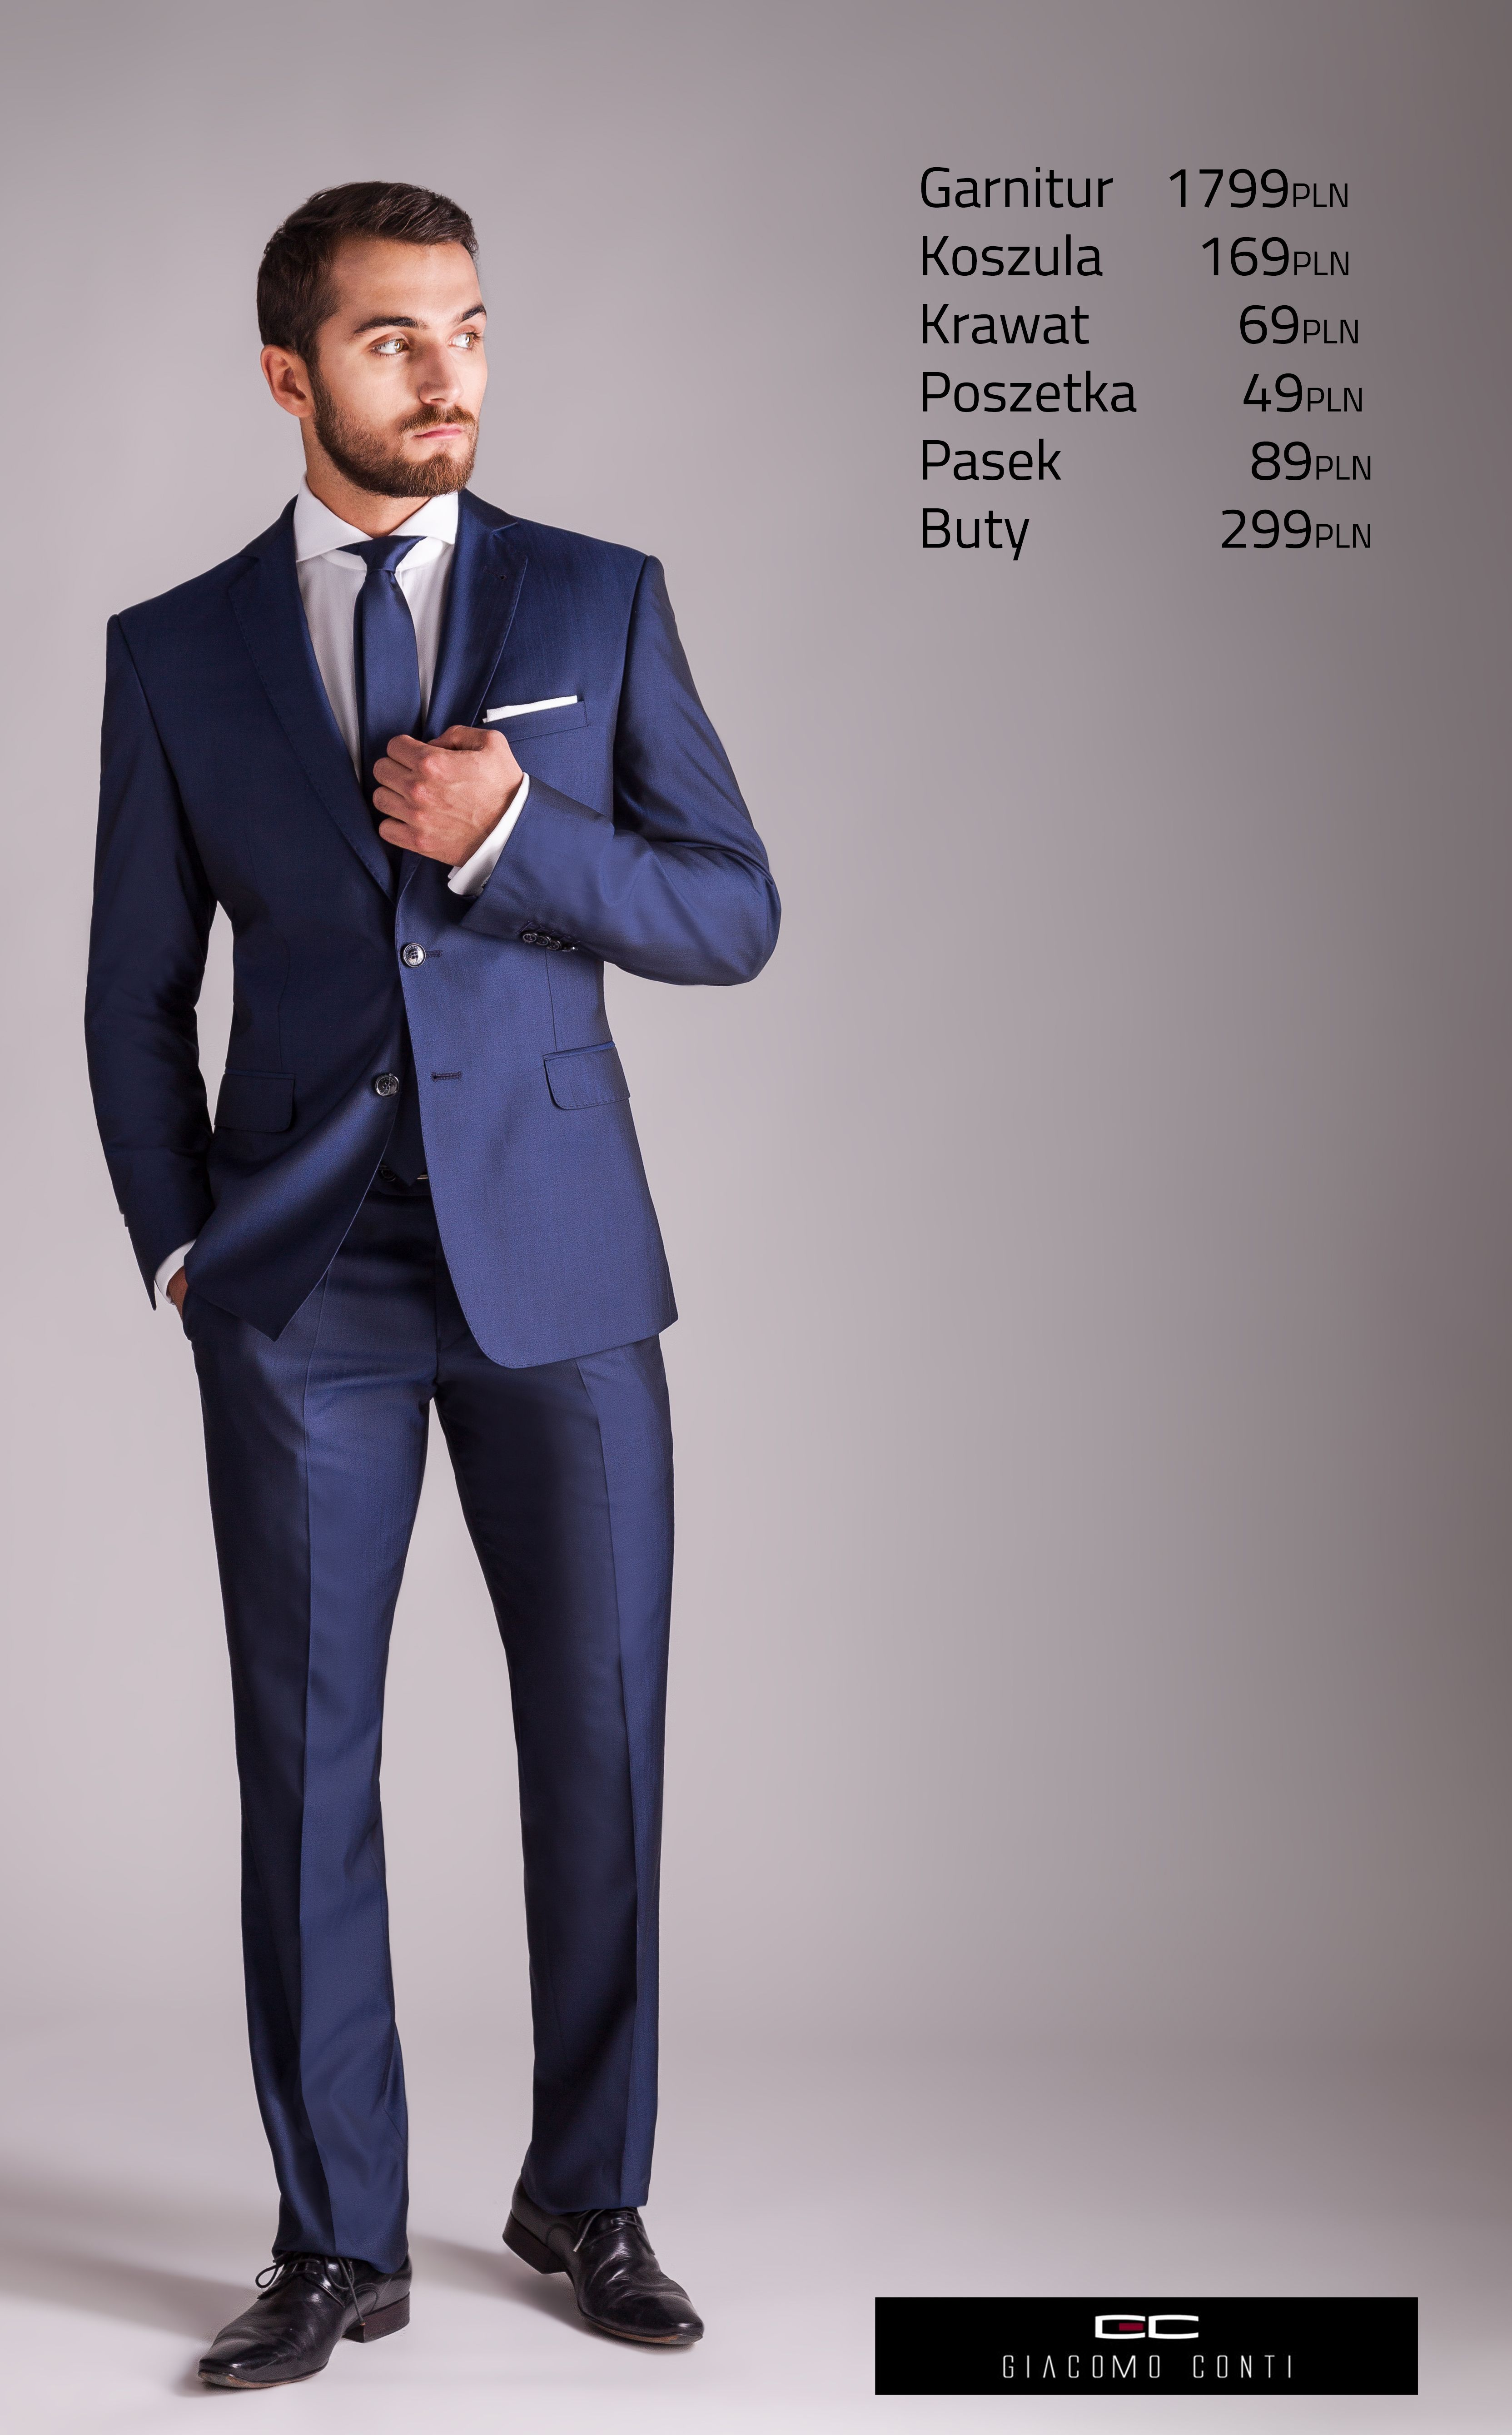 Stylizacja Slubna Giacomo Conti Z Garniturem Marco2 E14 16b Giacomoconti Suits